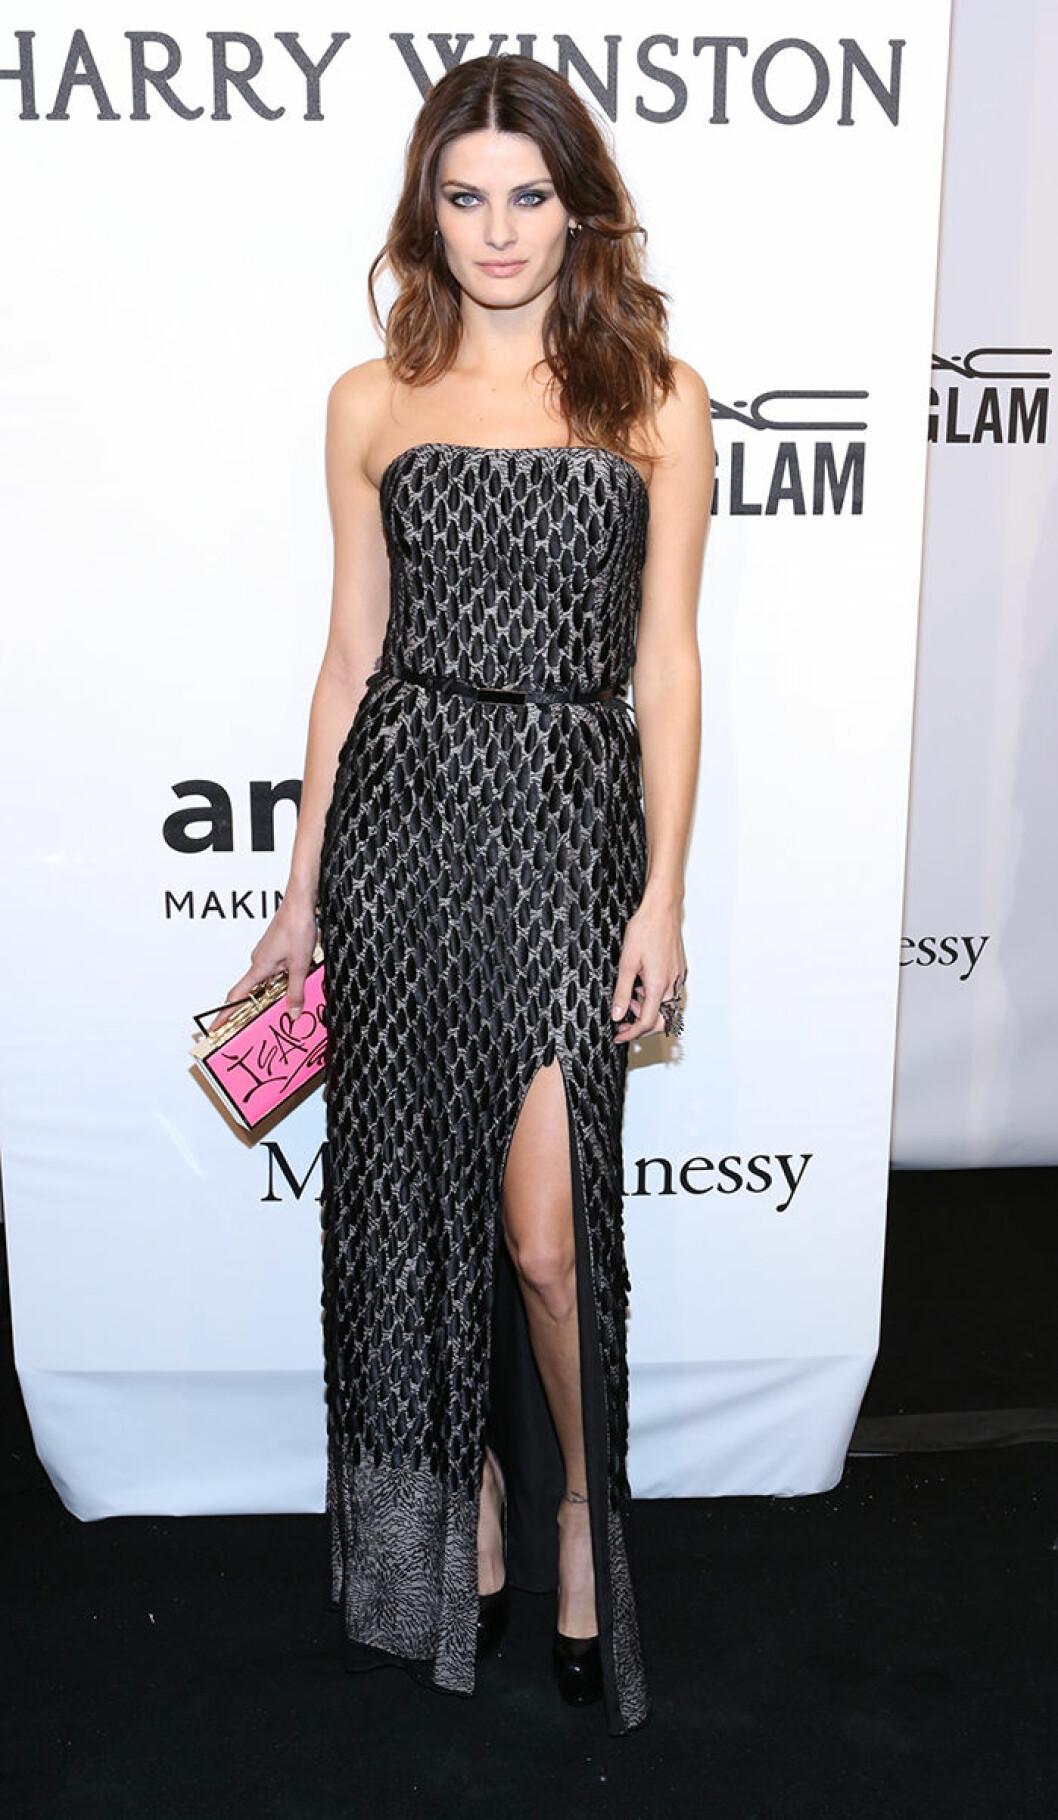 Isabeli Fontana seen attending the 2015 amfAR New York Gala at Cipriani Wall Street